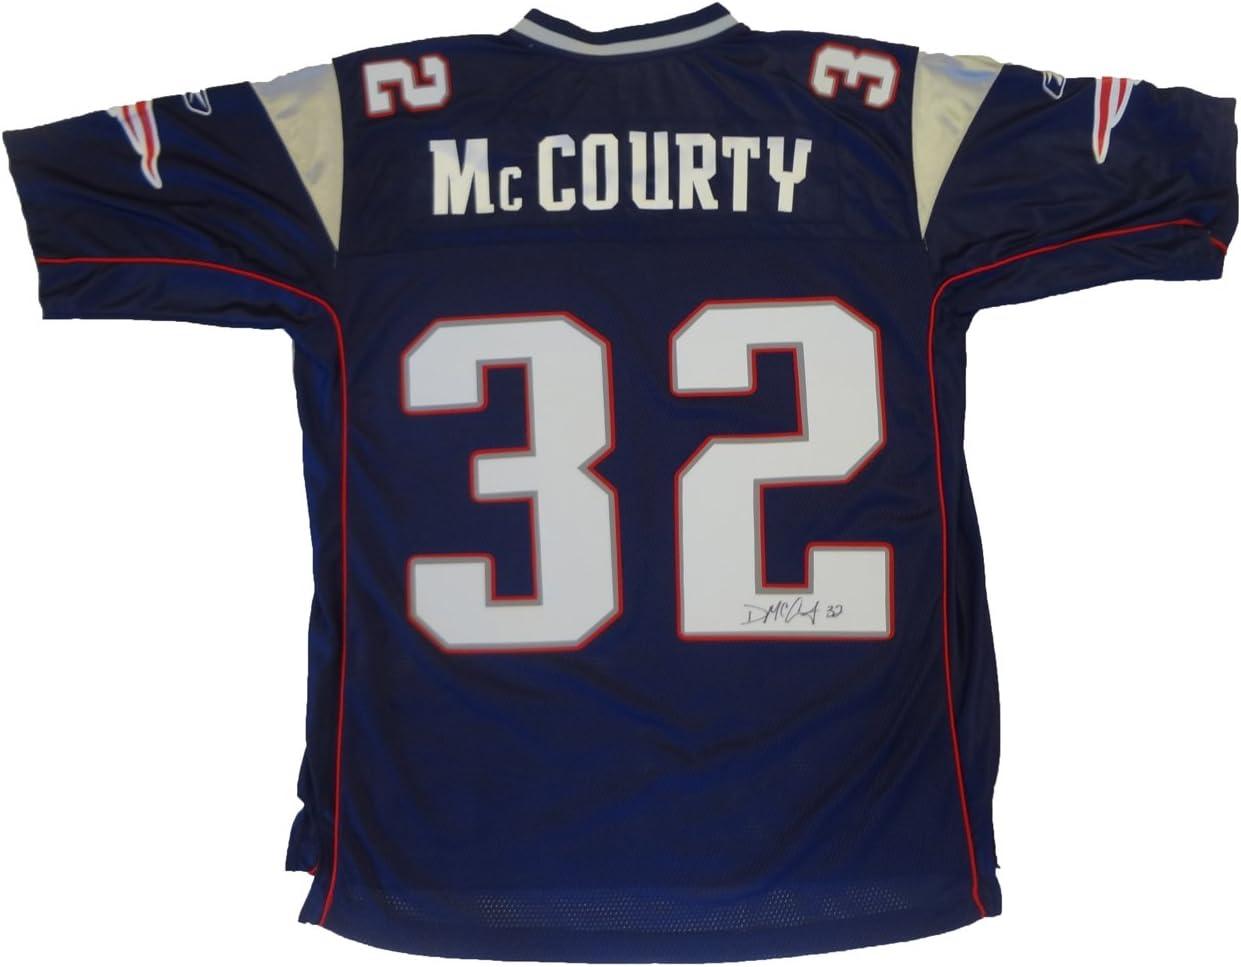 B00EOY3KU0 Devin McCourty Autographed New England Patriots Jersey W/PROOF Picture of Devin Signing For Us, New England Patriots, Rutgers Scarlet Knights, 2010 NFL Draft, Top Prospect, Pro Bowl 61tlfSUixfL.SL1291_